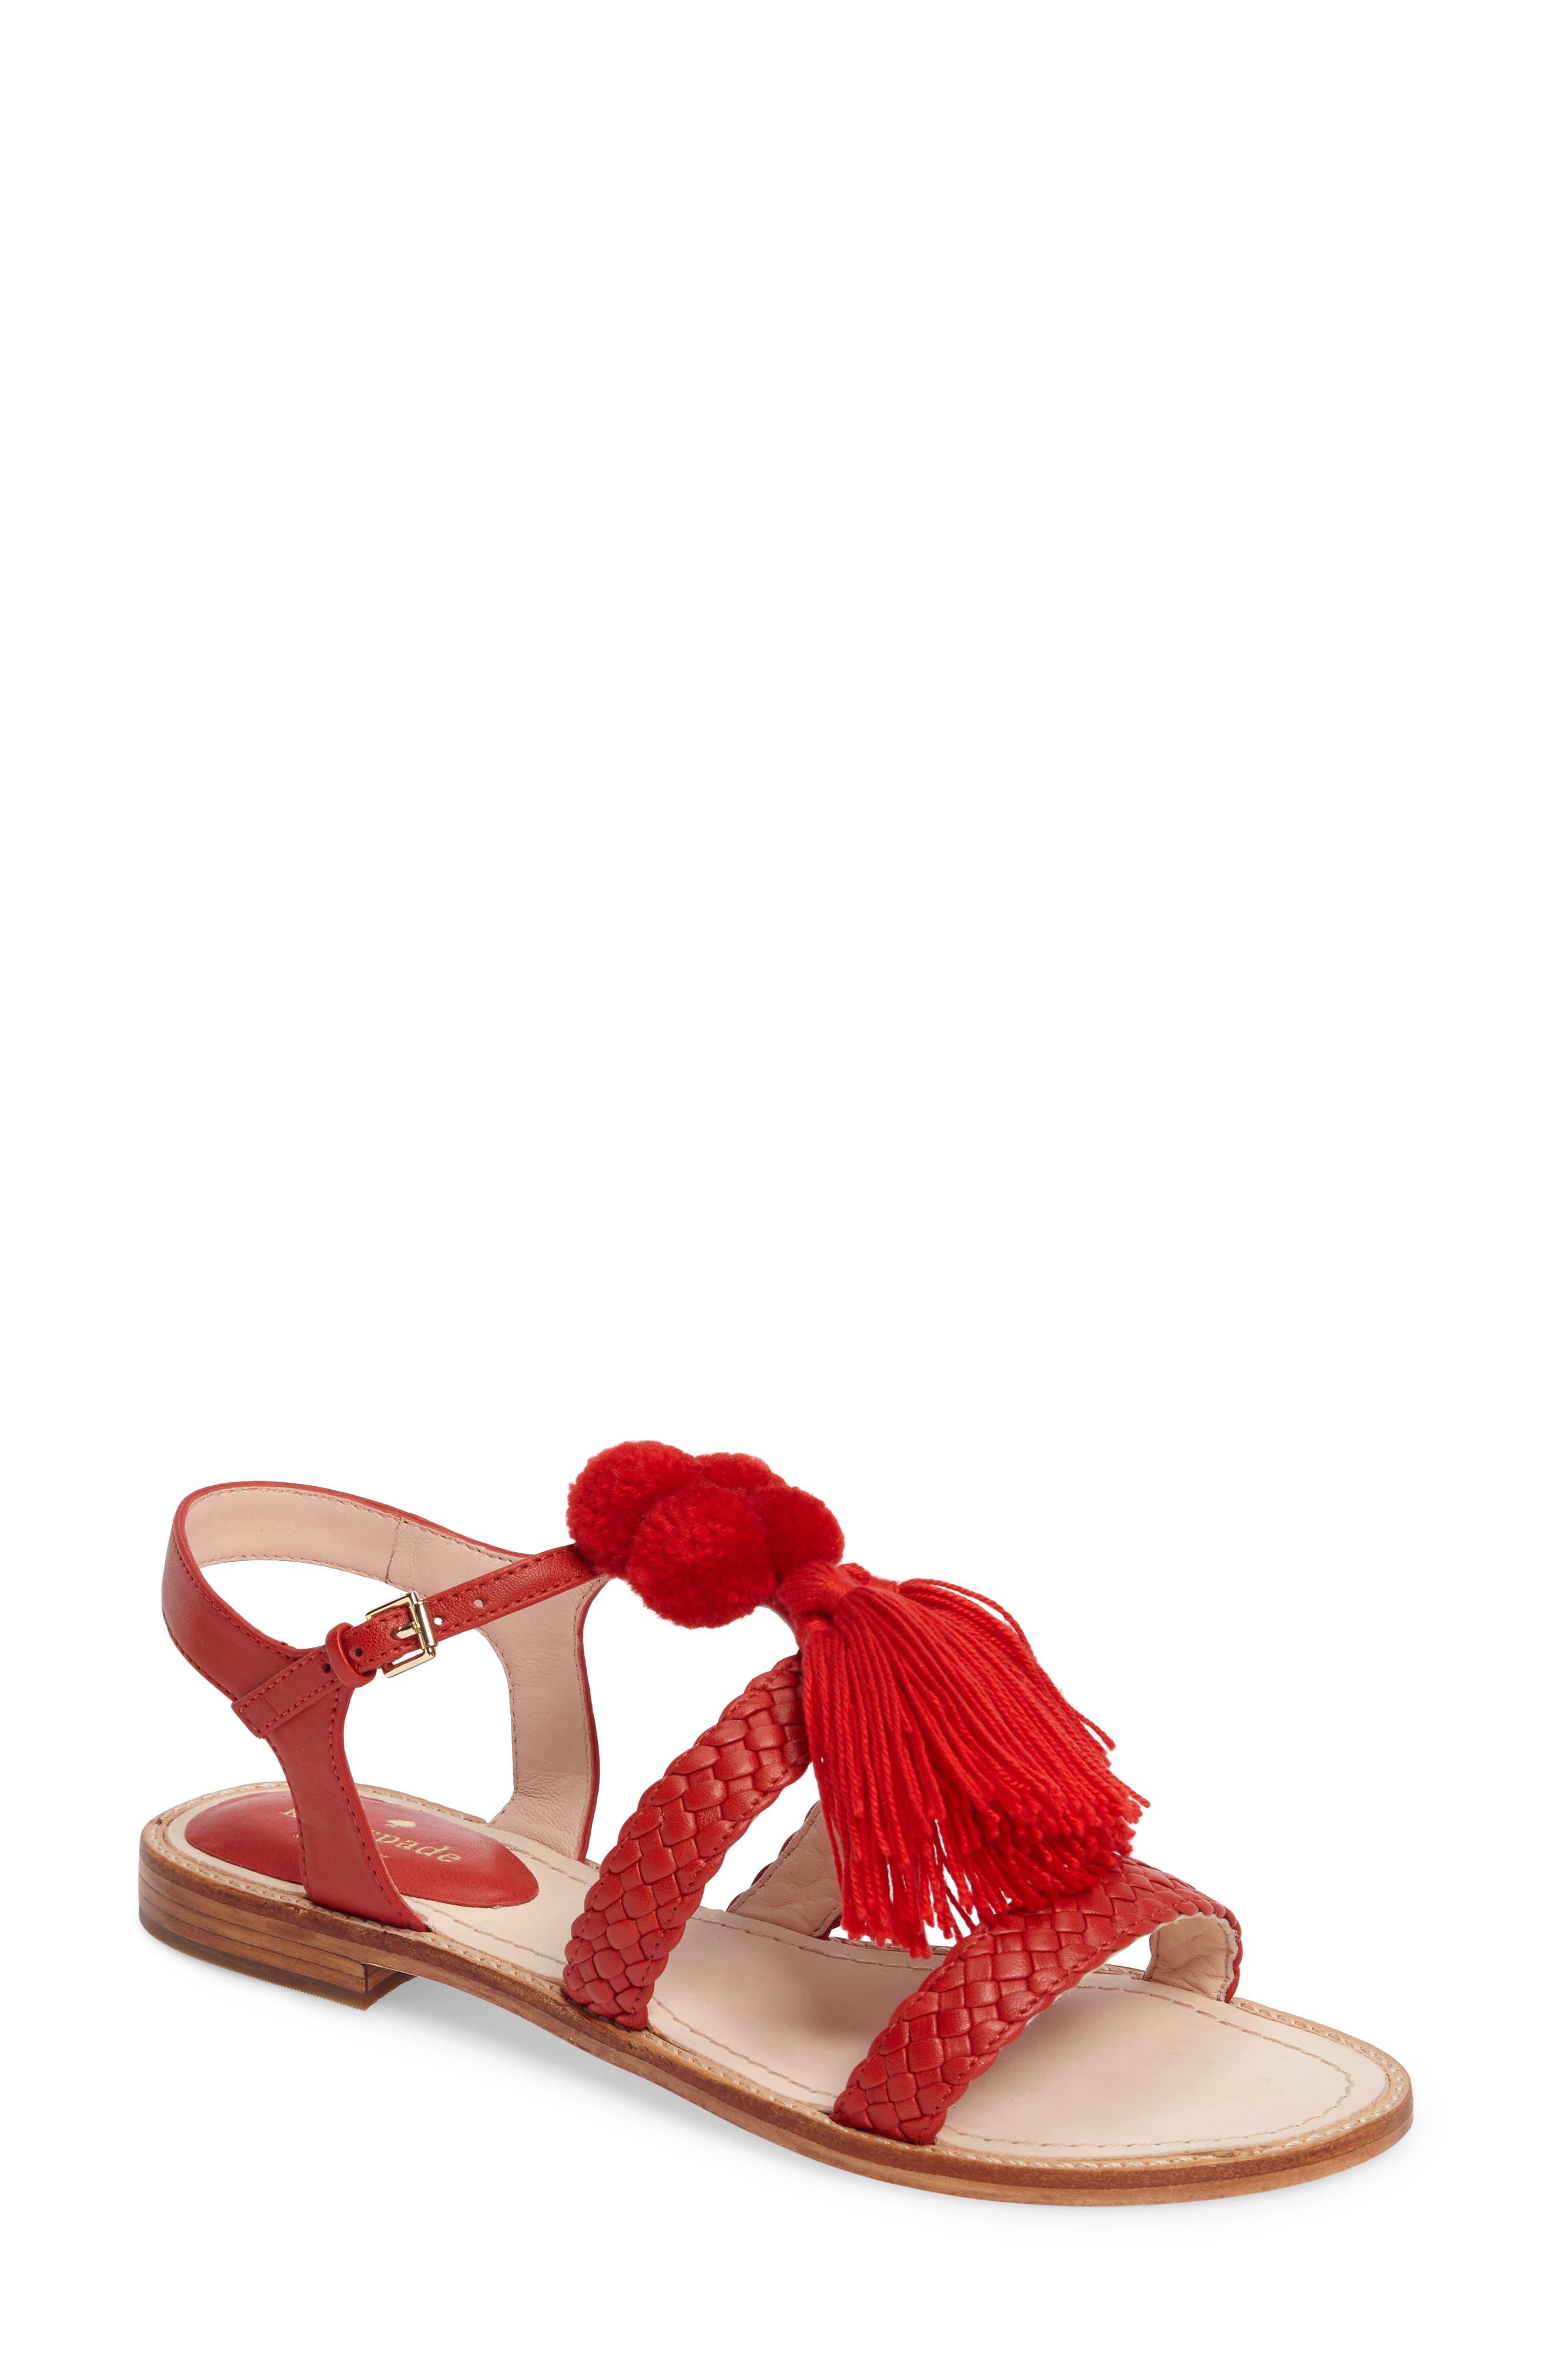 Main Image - kate spade new york sunset flat sandal (Women)